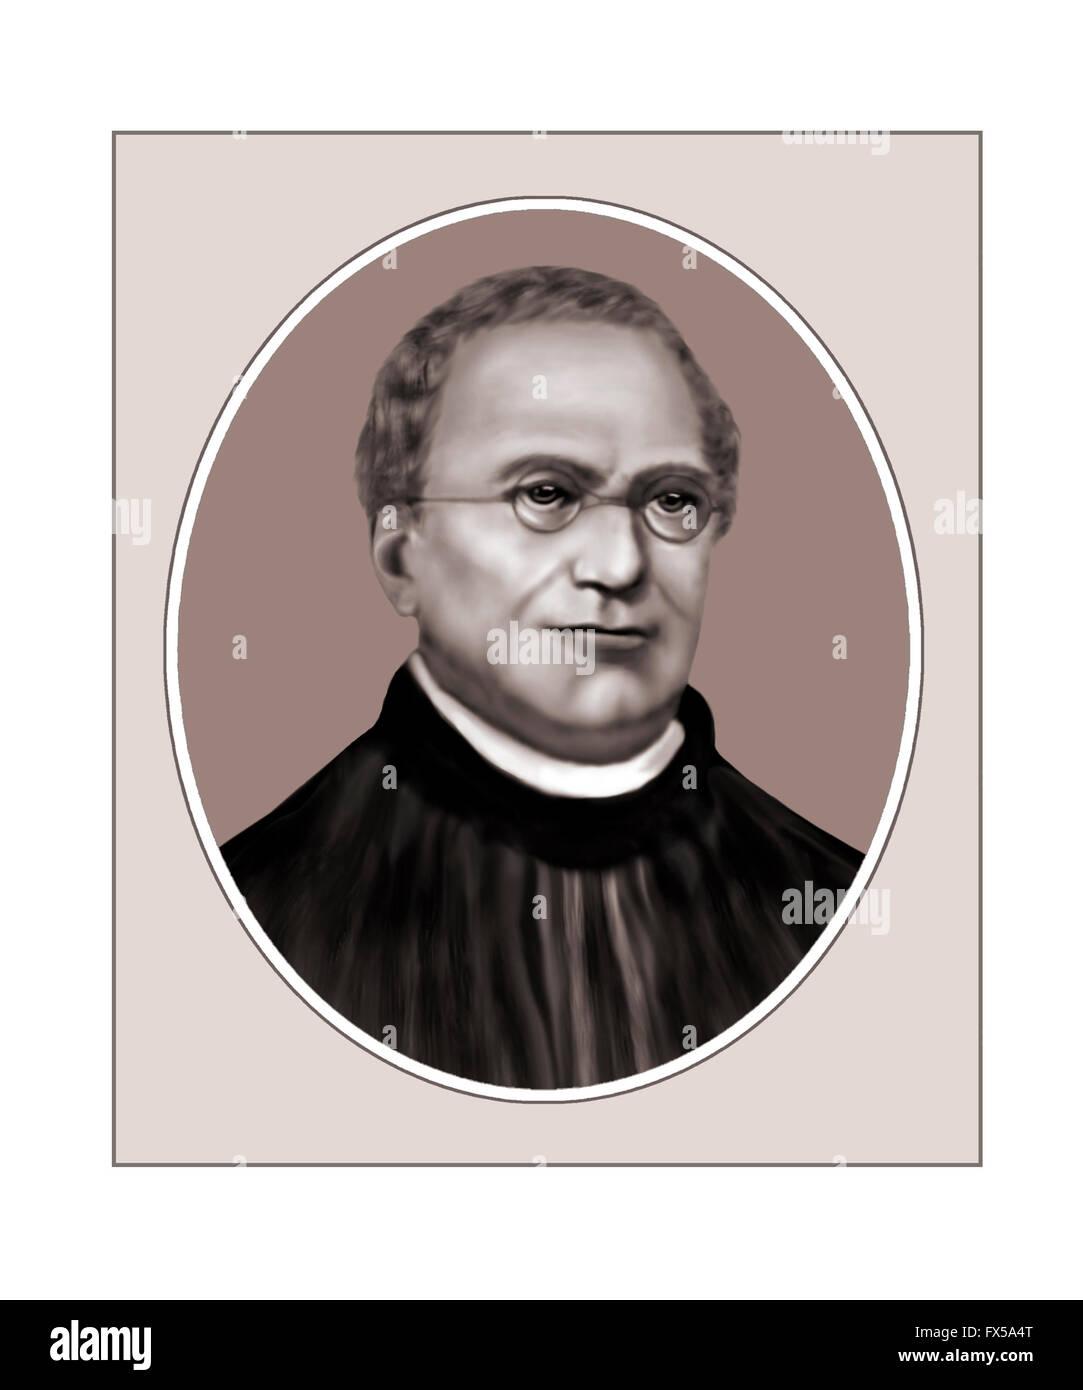 Gregor Johann Mendel, 1822-1884, Moravian Monk - Stock Image